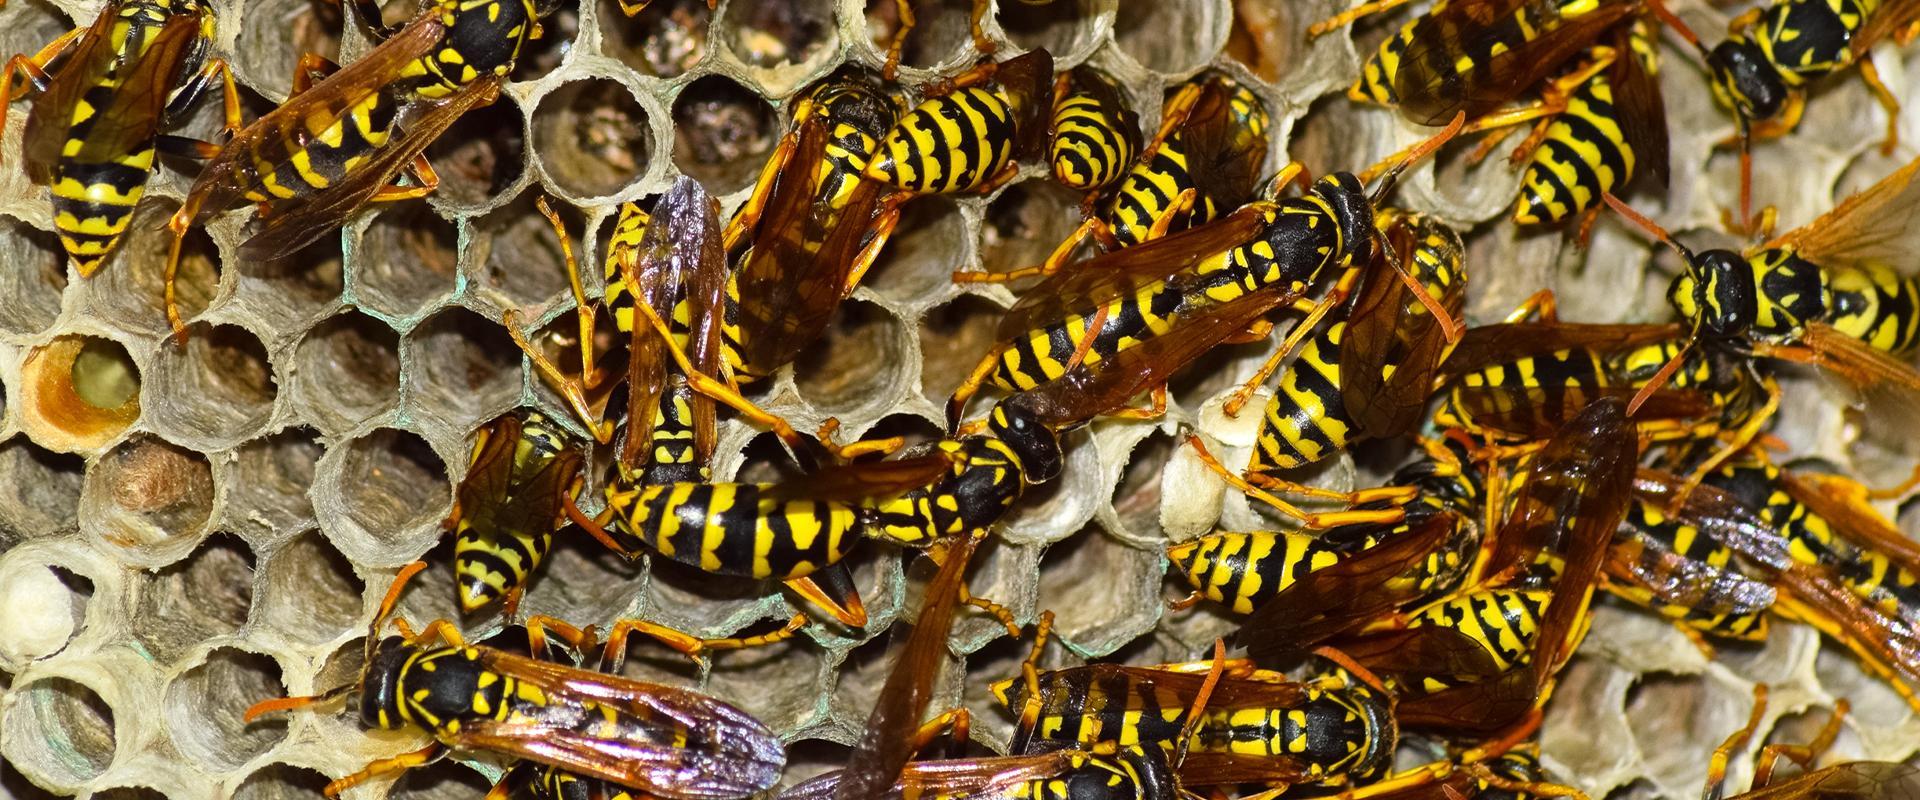 wasps in a nest in fayetteville georgia